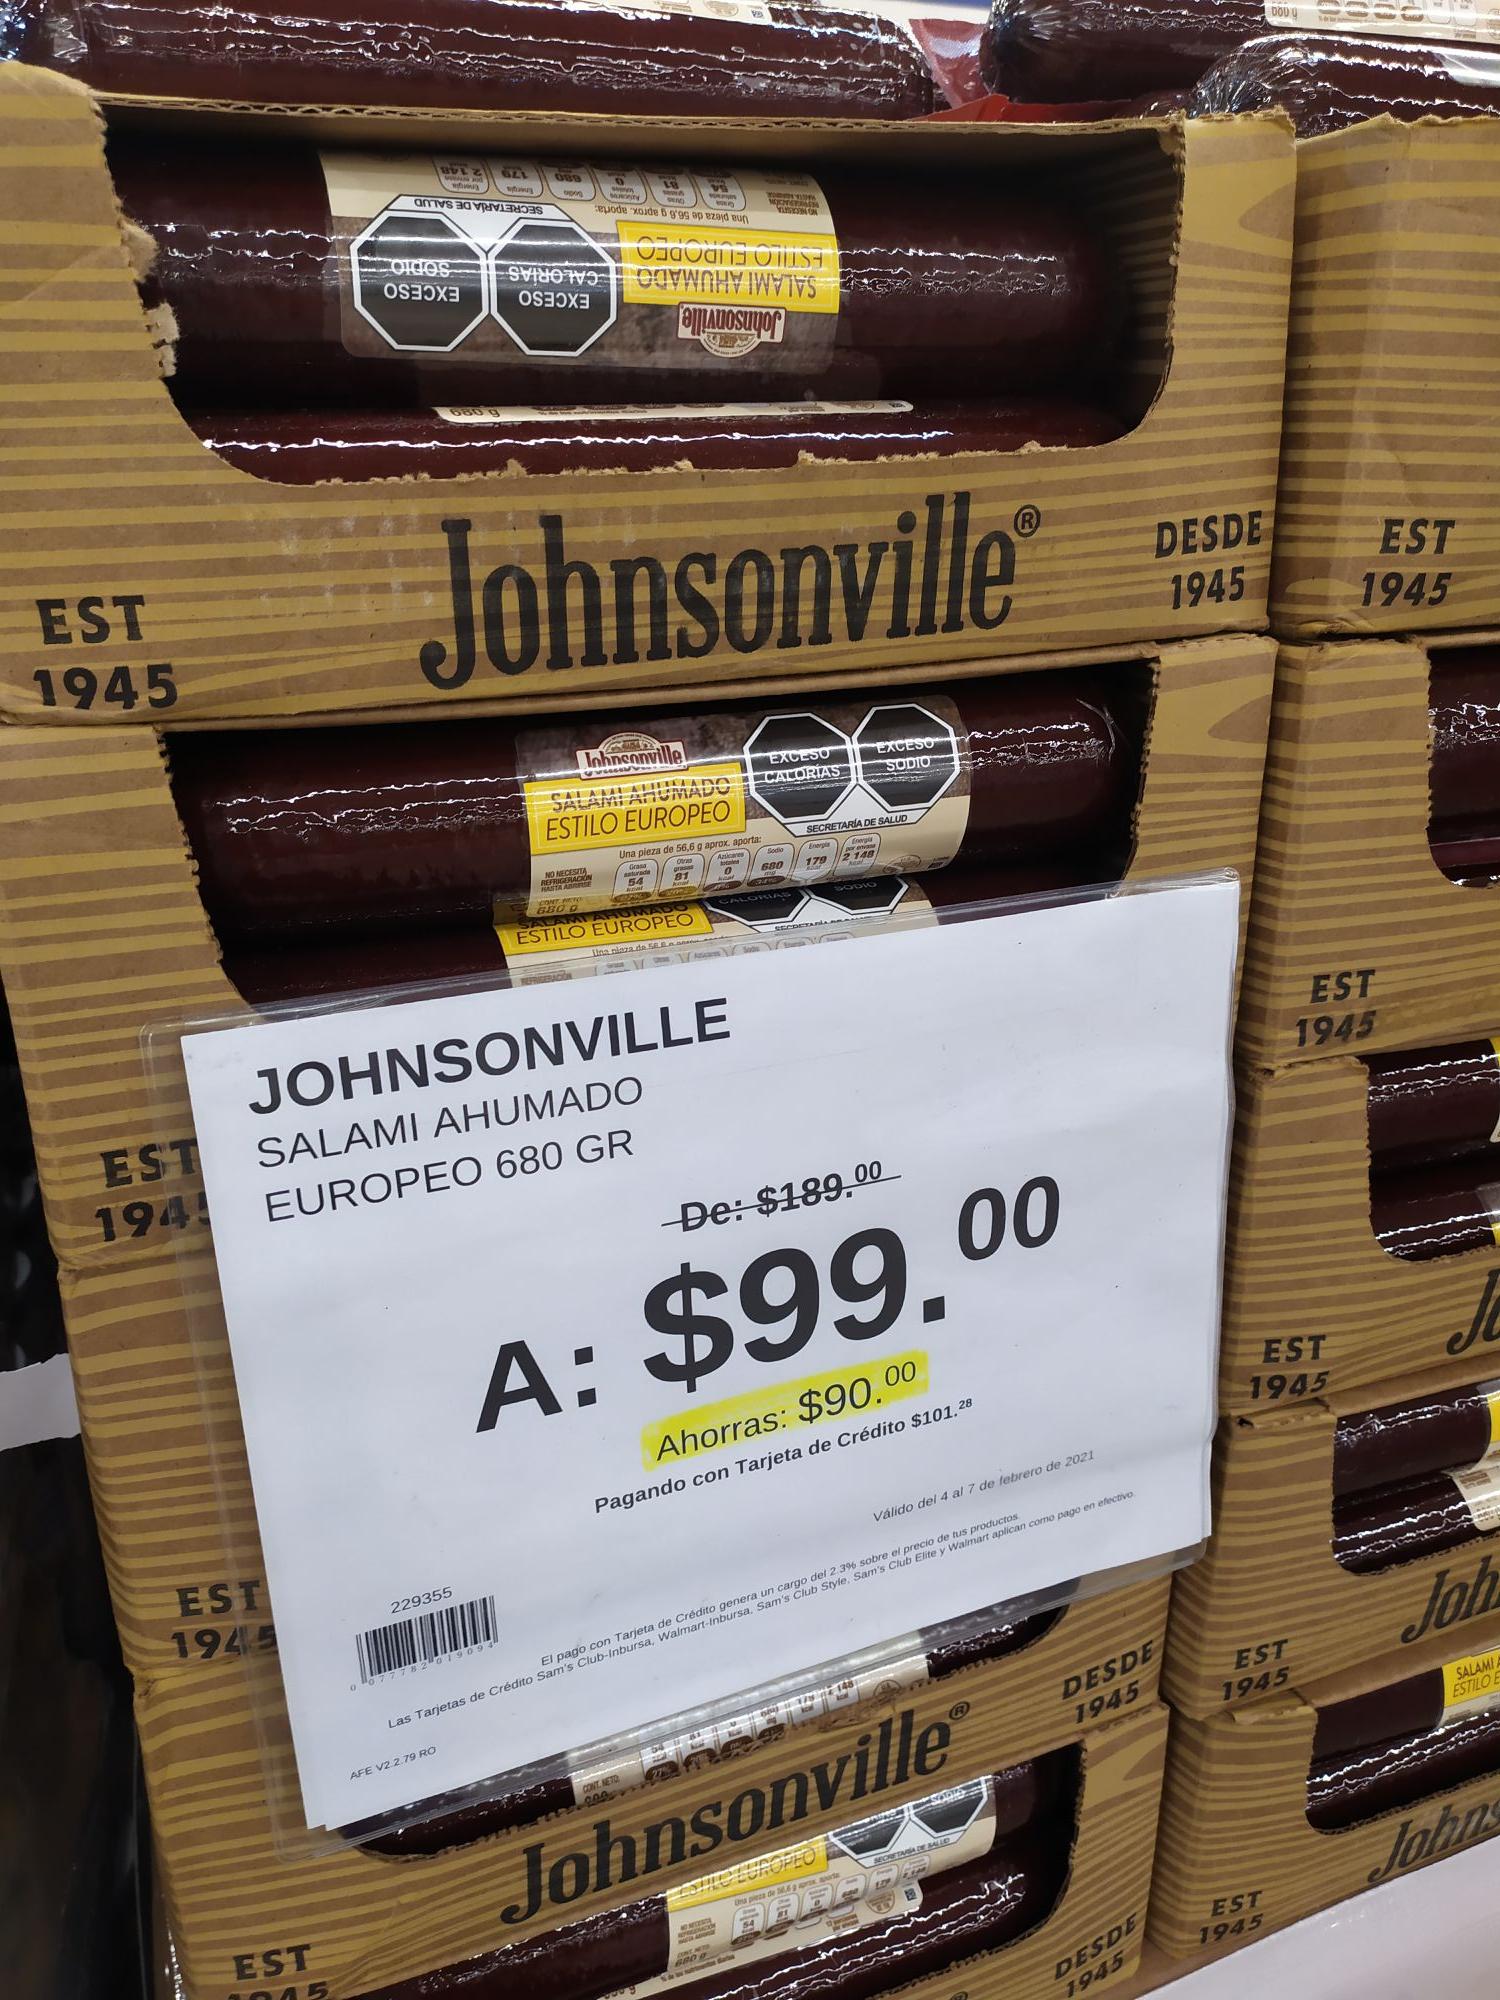 Sam's Club: Salami Europeo Jhonsonville $99